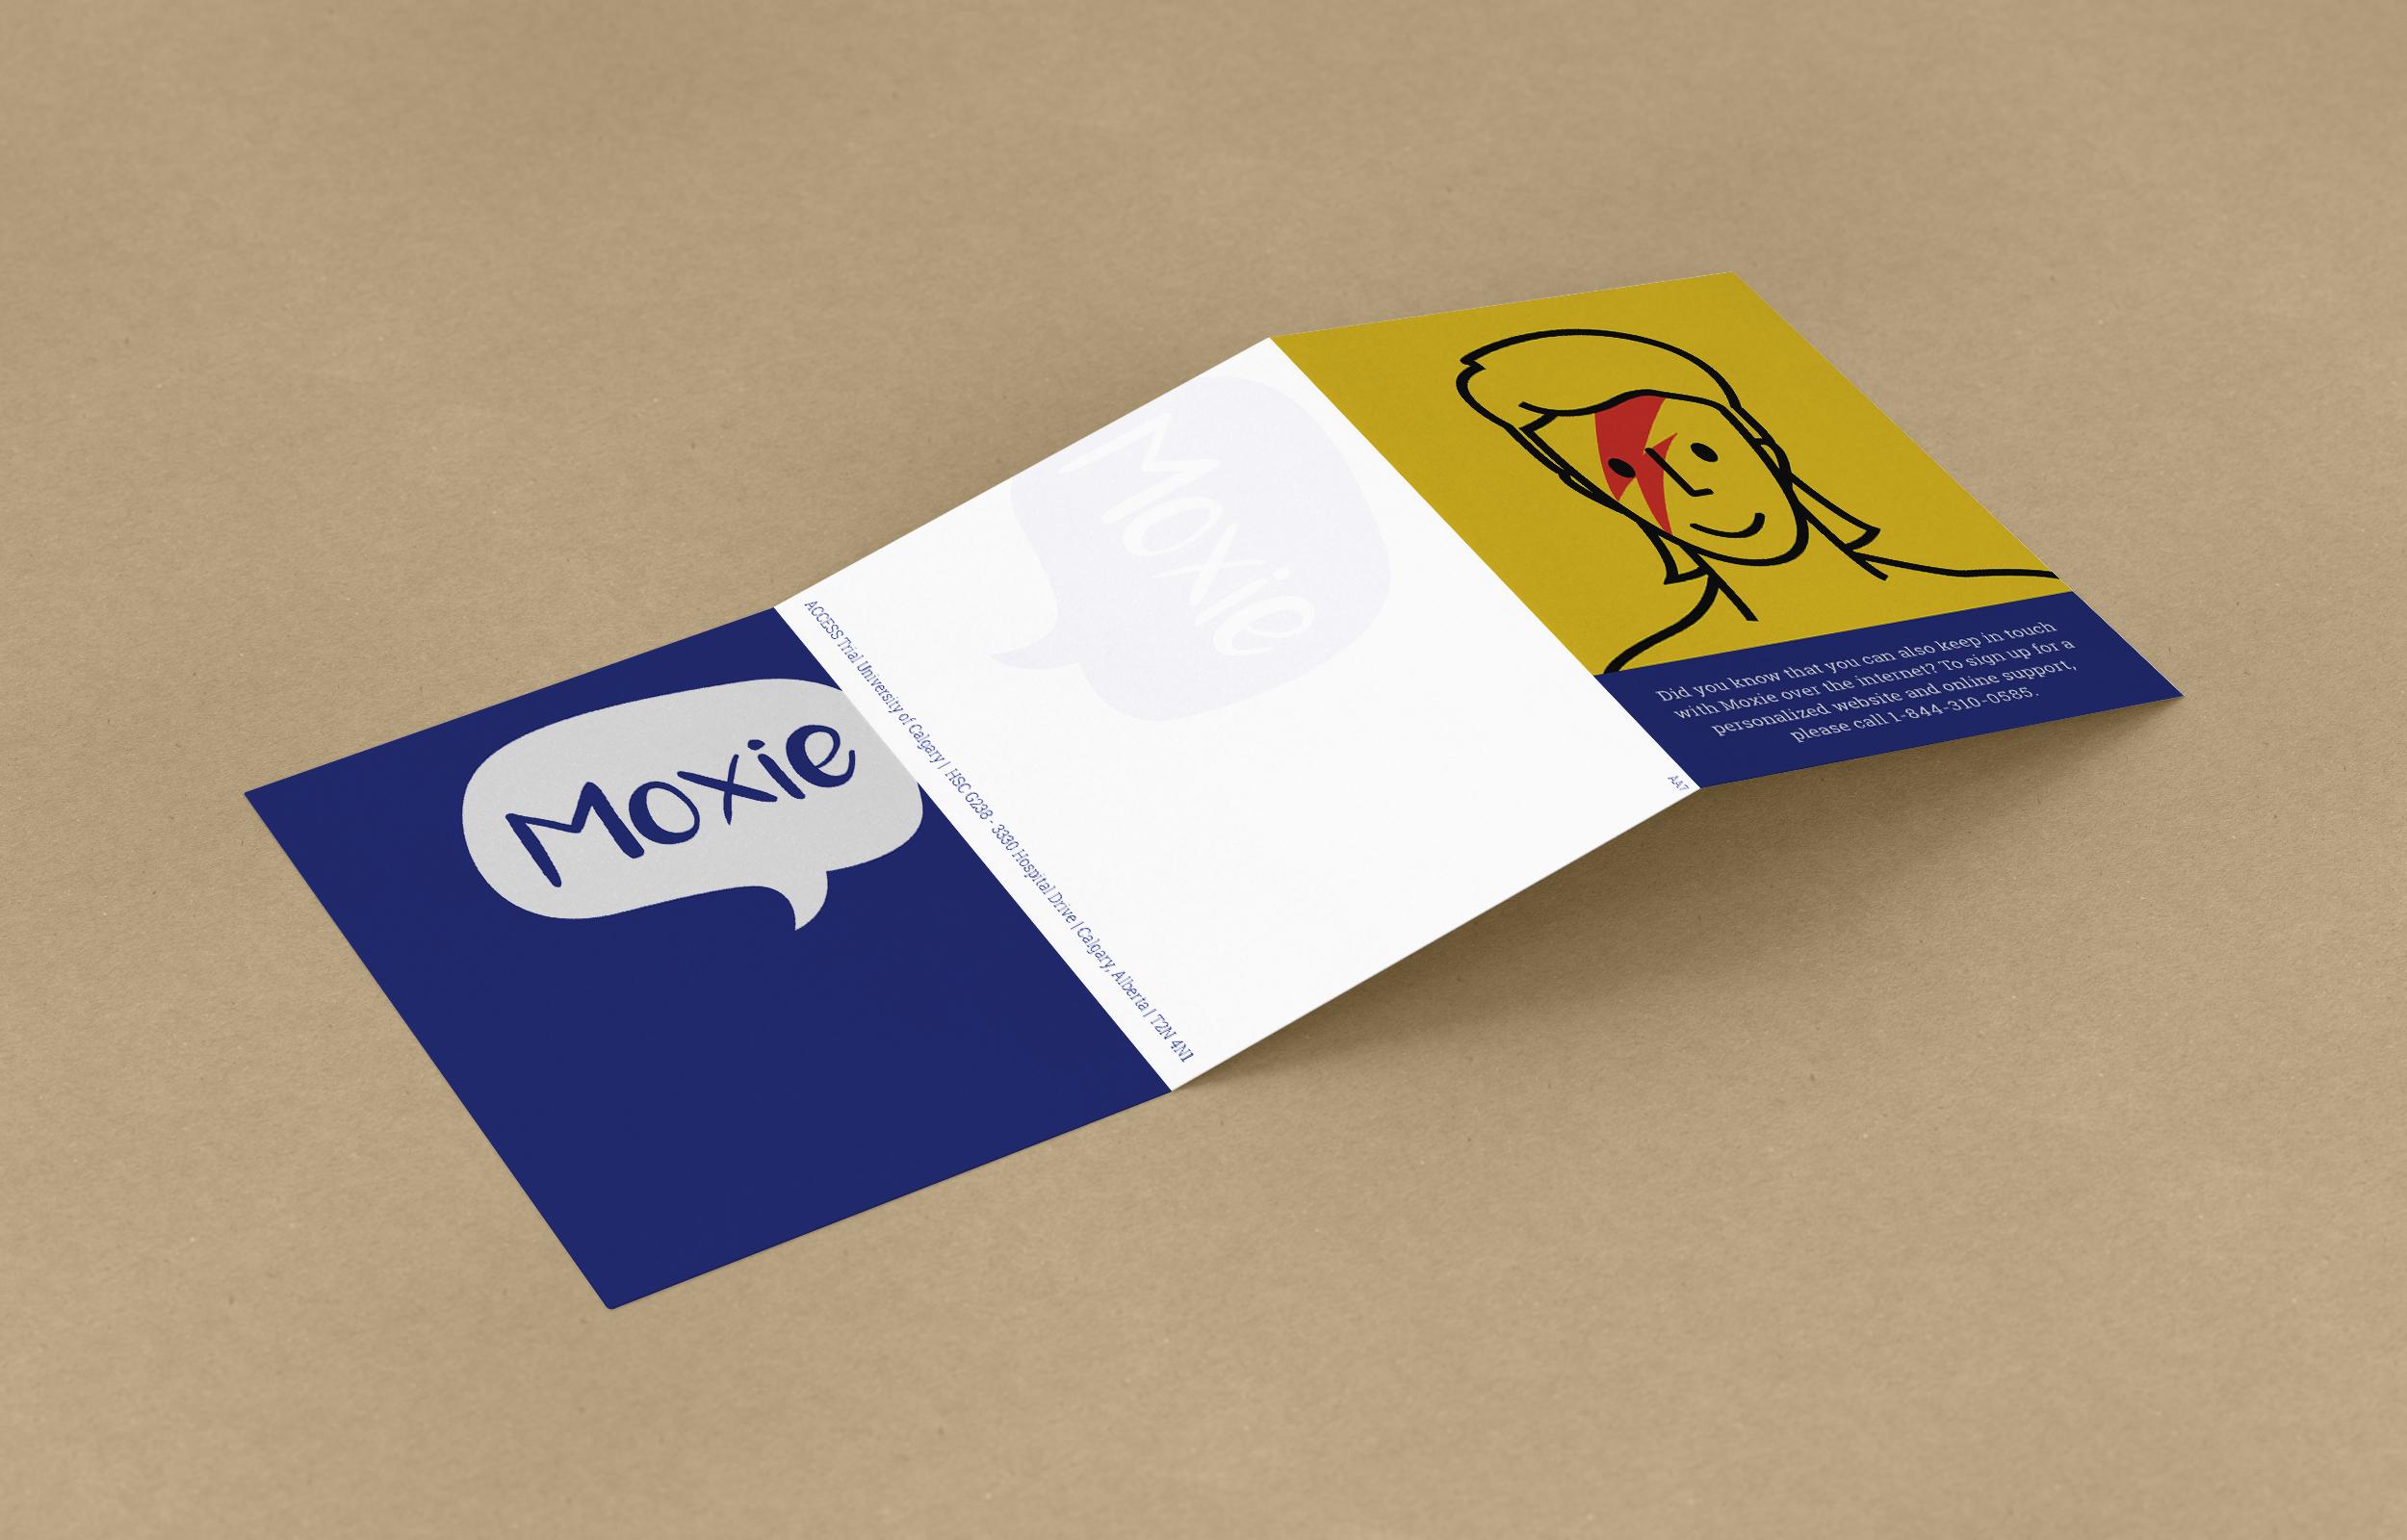 Mockup_Leaflet_3.jpg